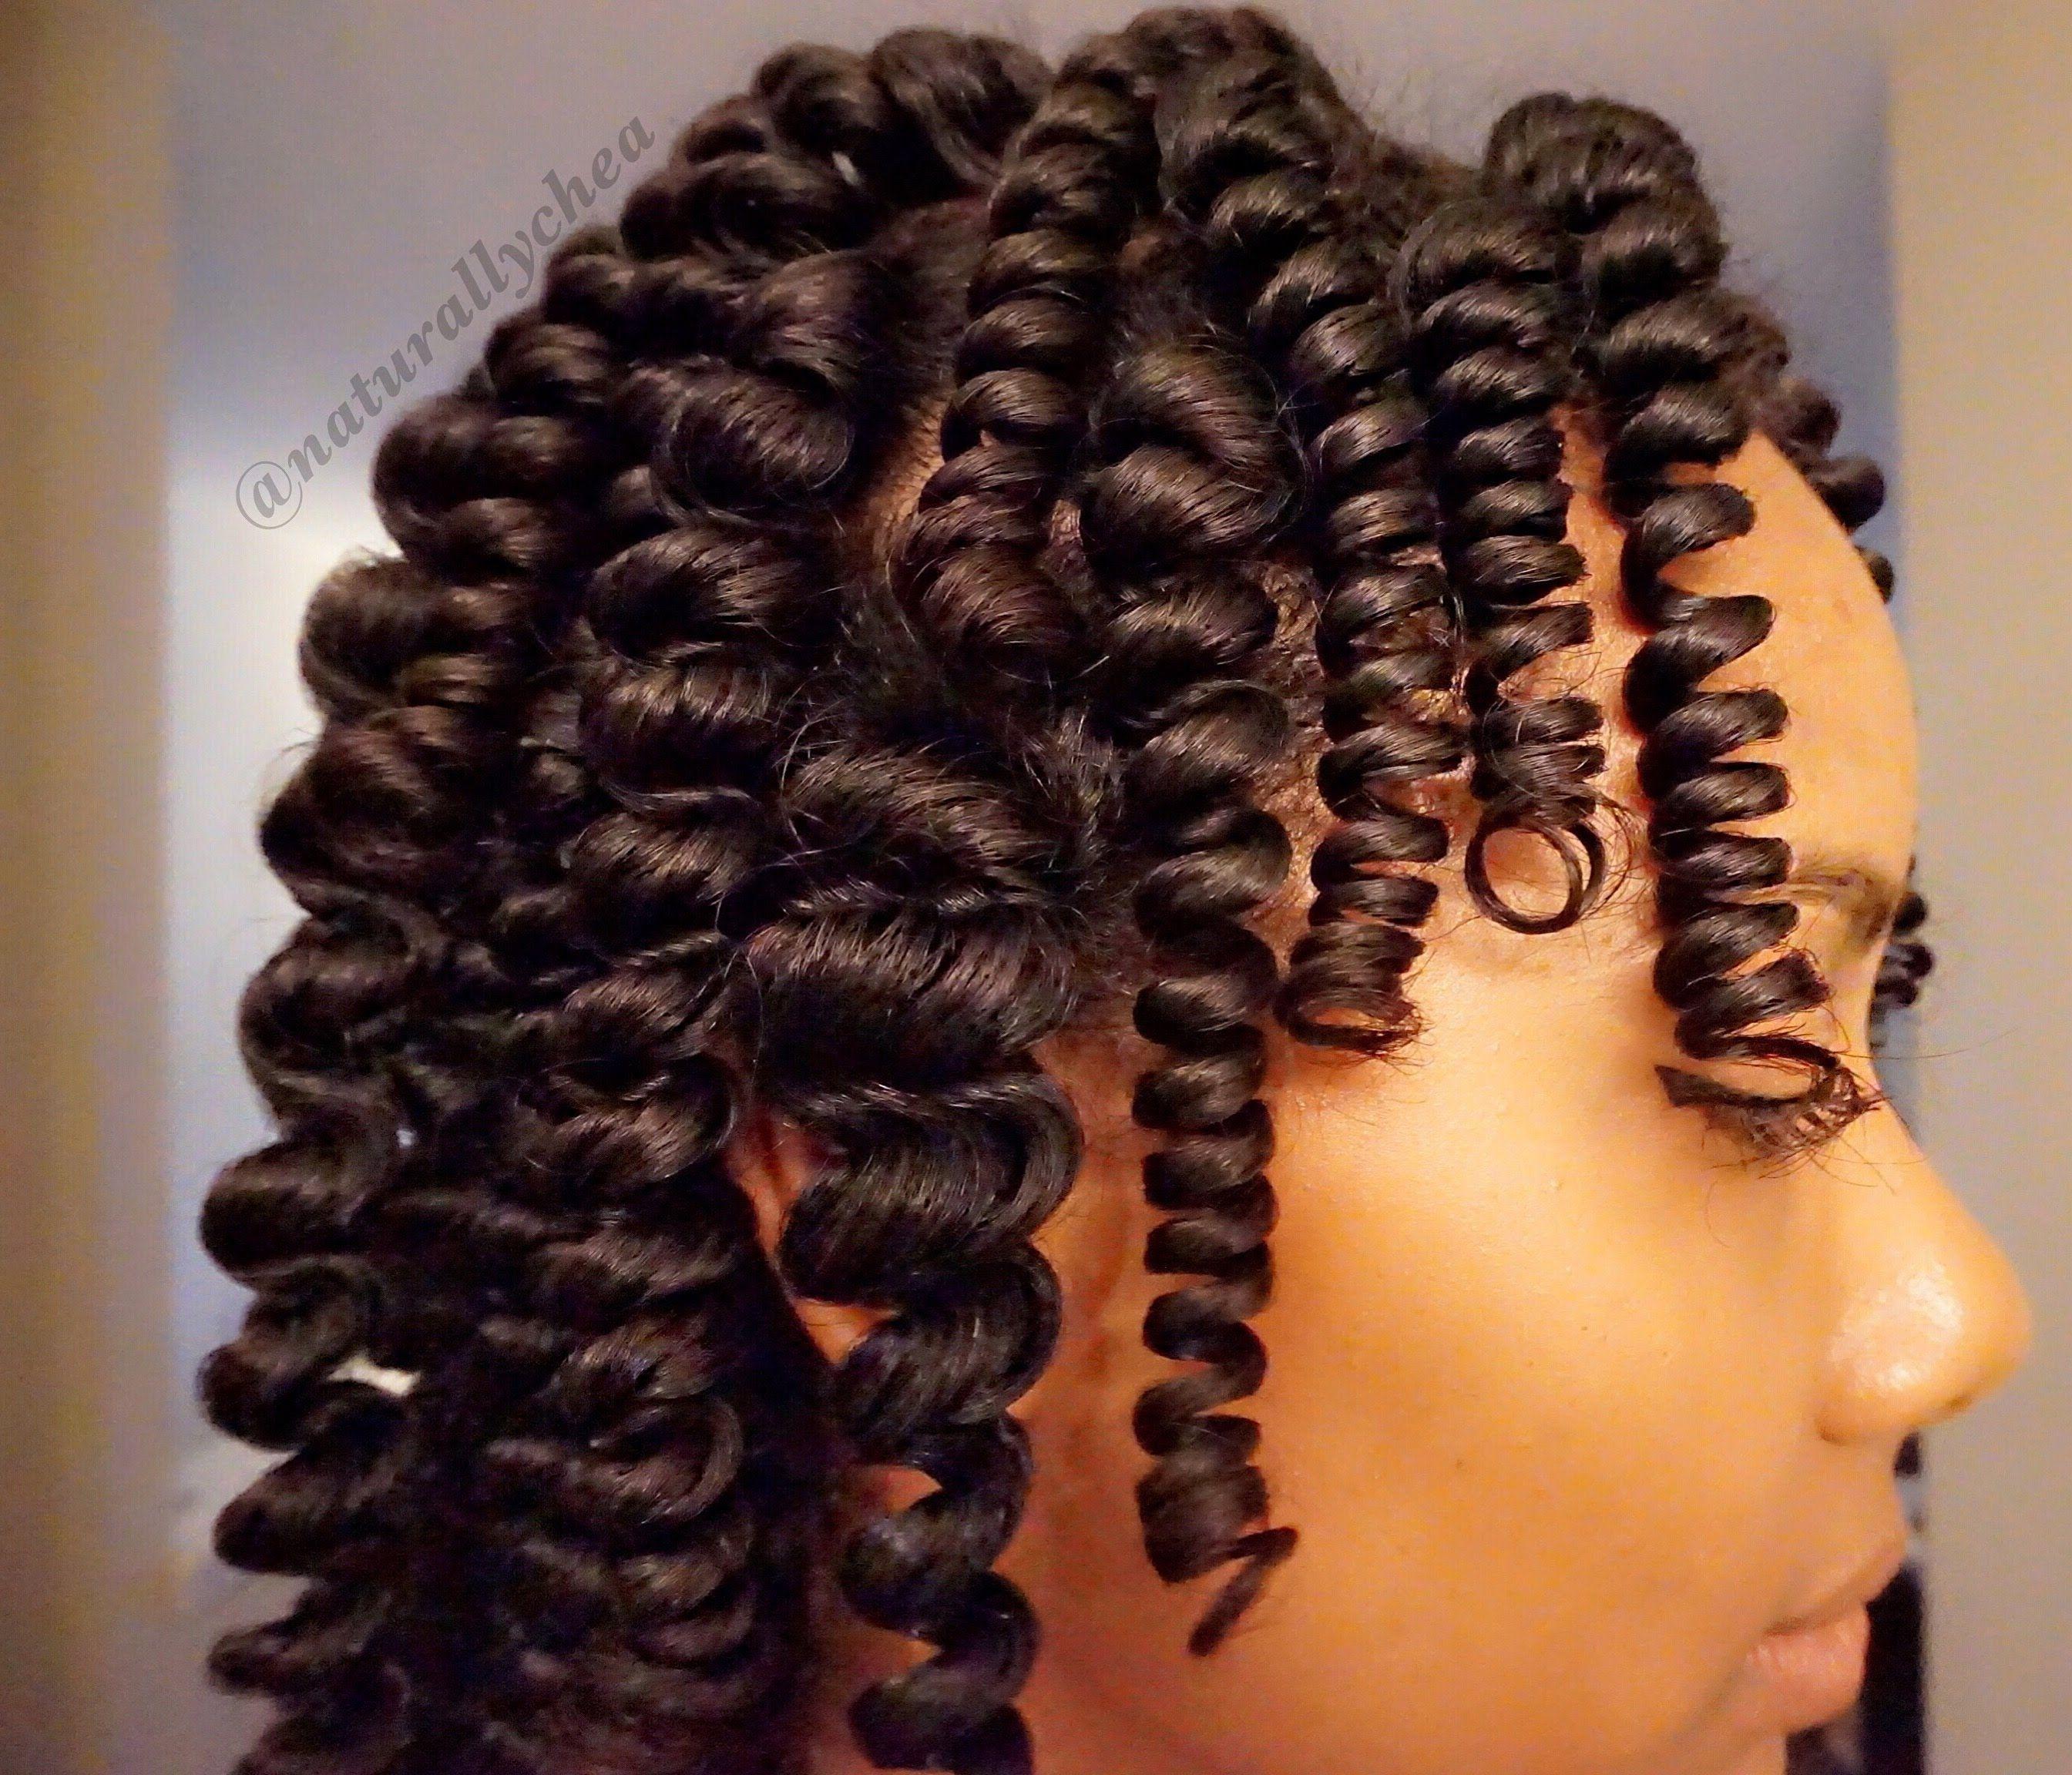 Heatless coils natural hair roller set baby hairs pinterest